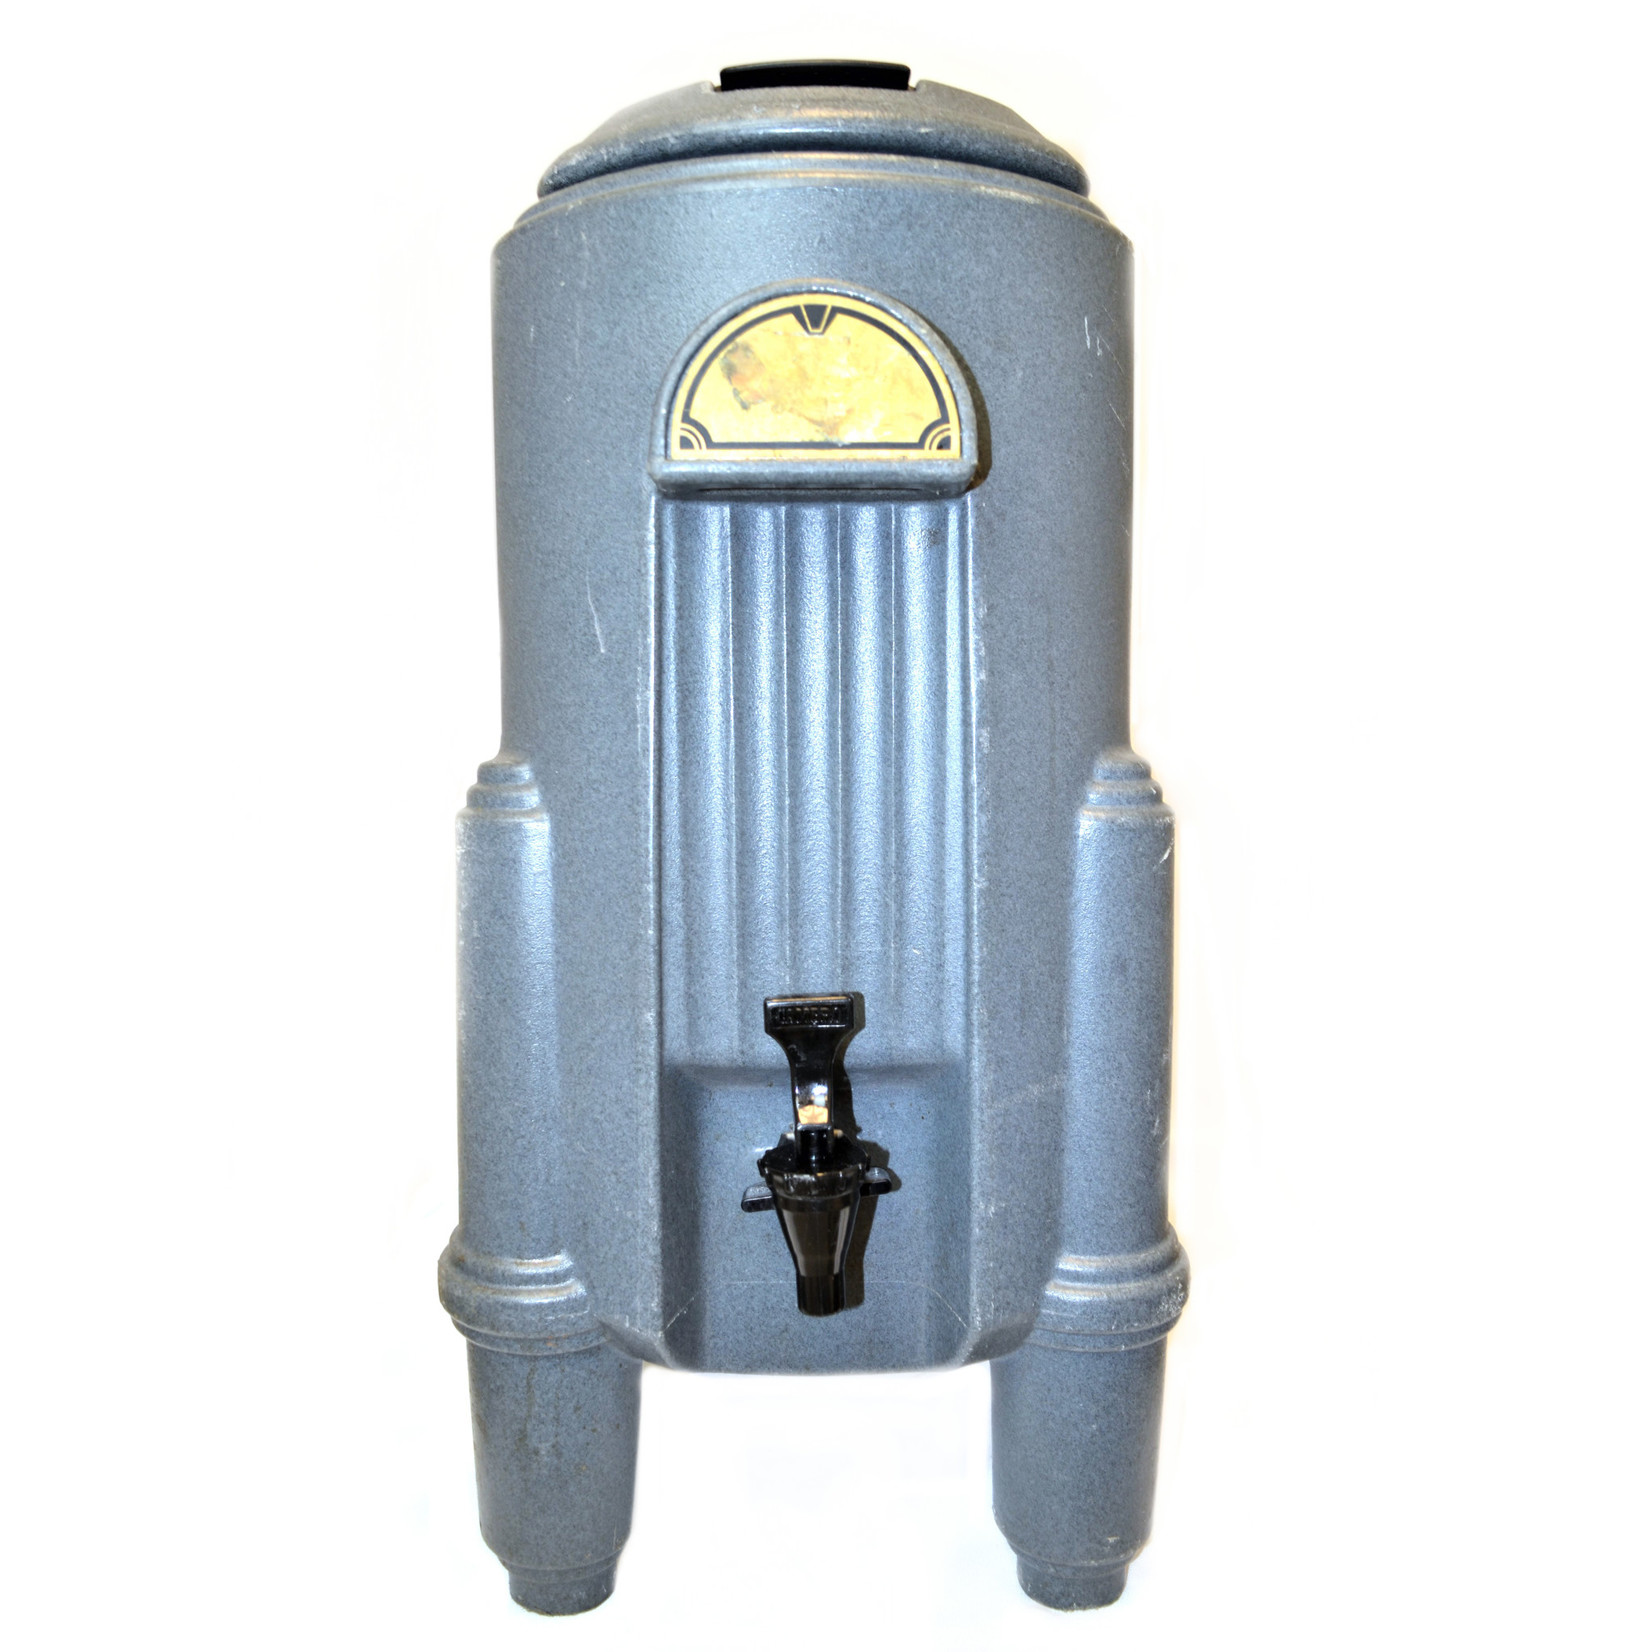 5 Gallon Beverage Dispenser